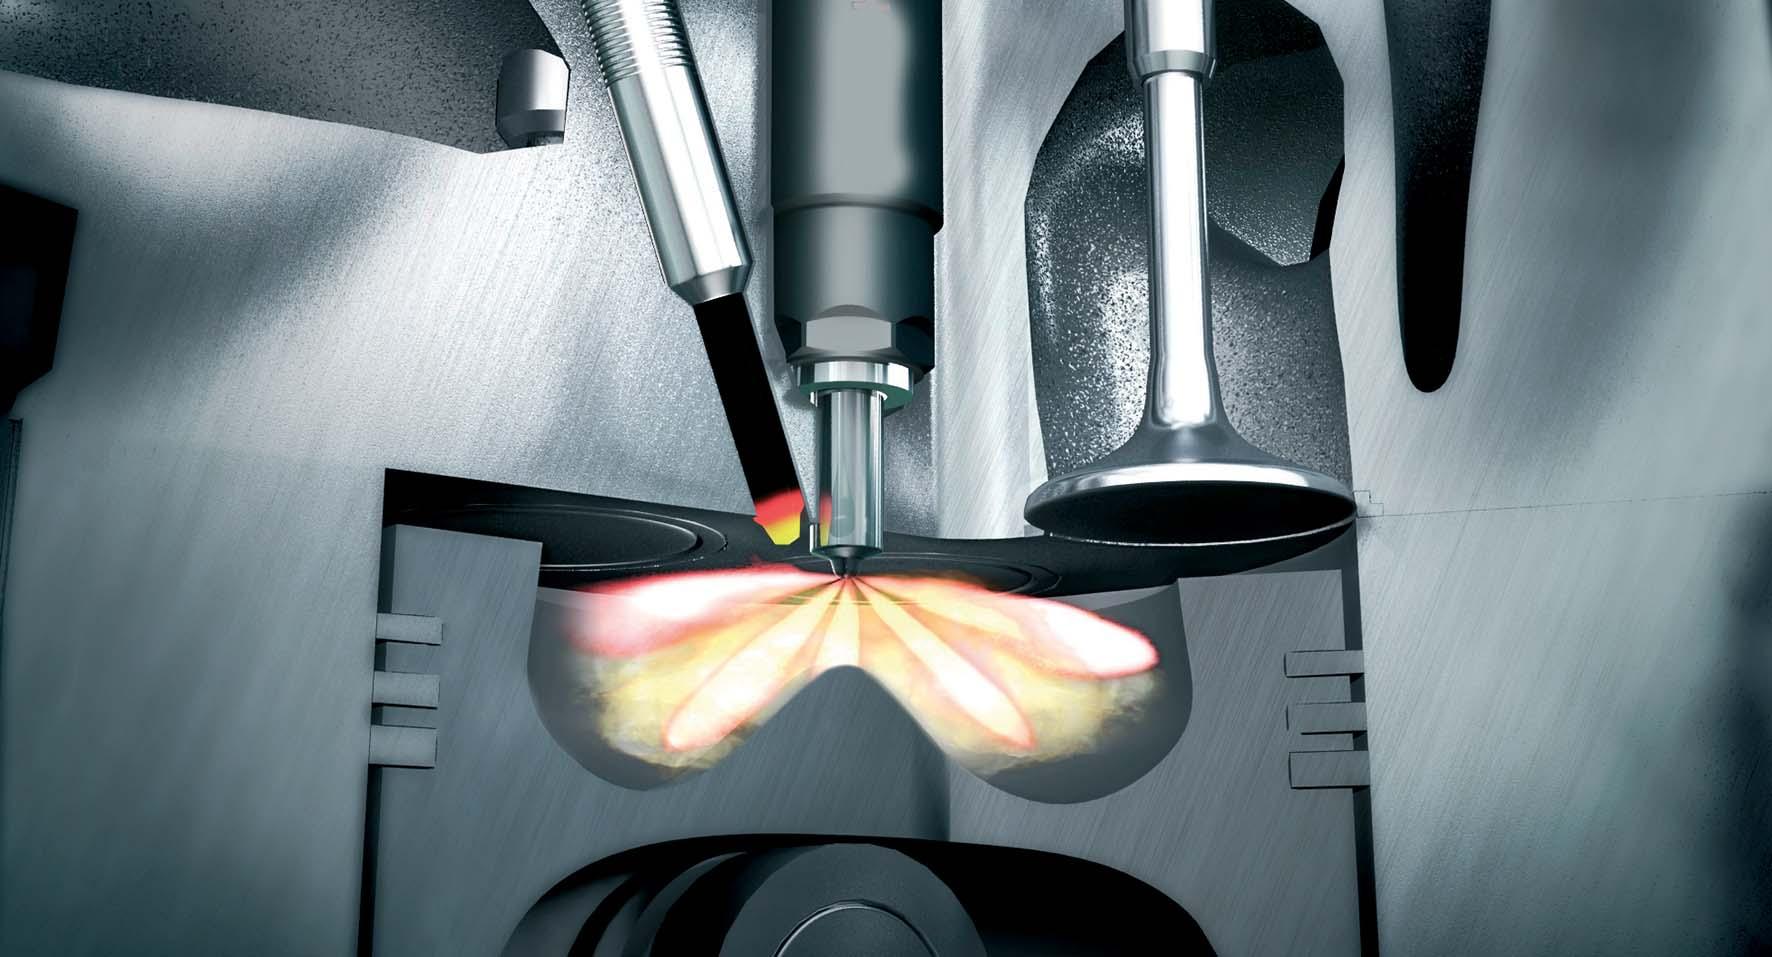 Bosch 2005 iniezione diretta diesel cilindro